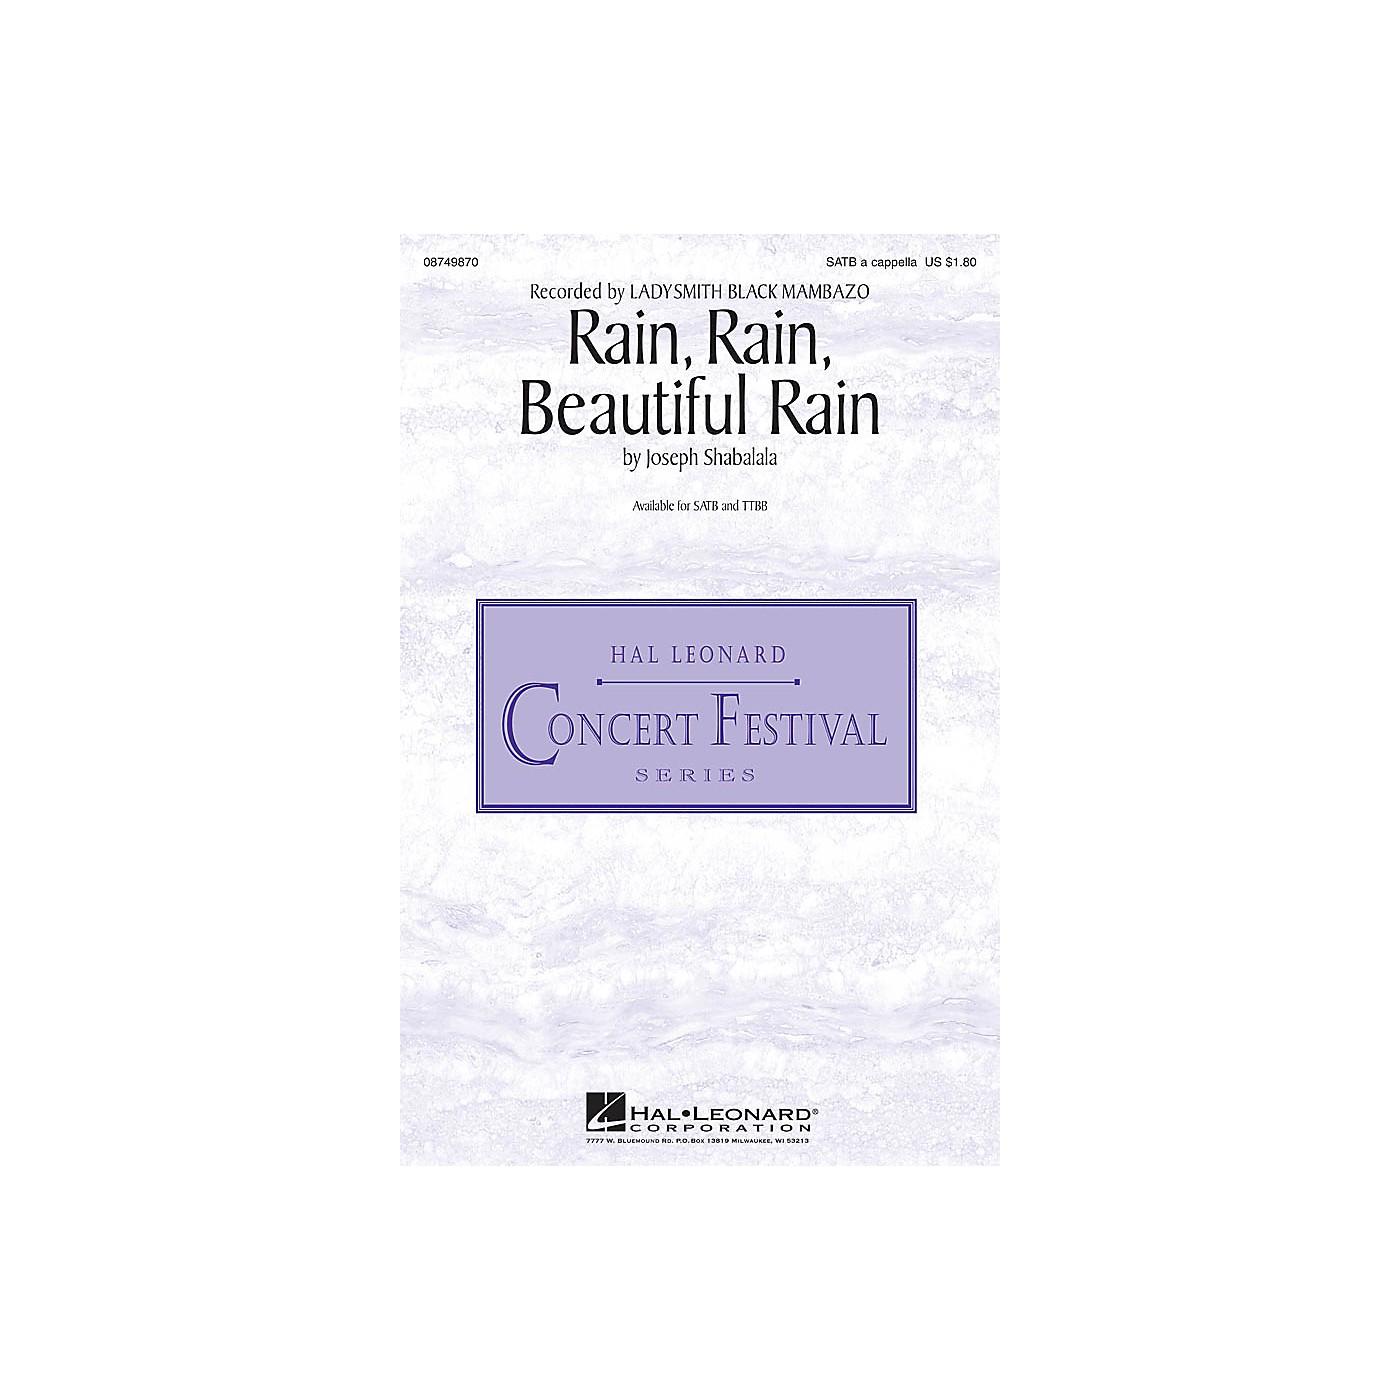 Hal Leonard Rain, Rain, Beautiful Rain TTBB A Cappella by Ladysmith Black Mambazo Composed by Joseph Shabalala thumbnail